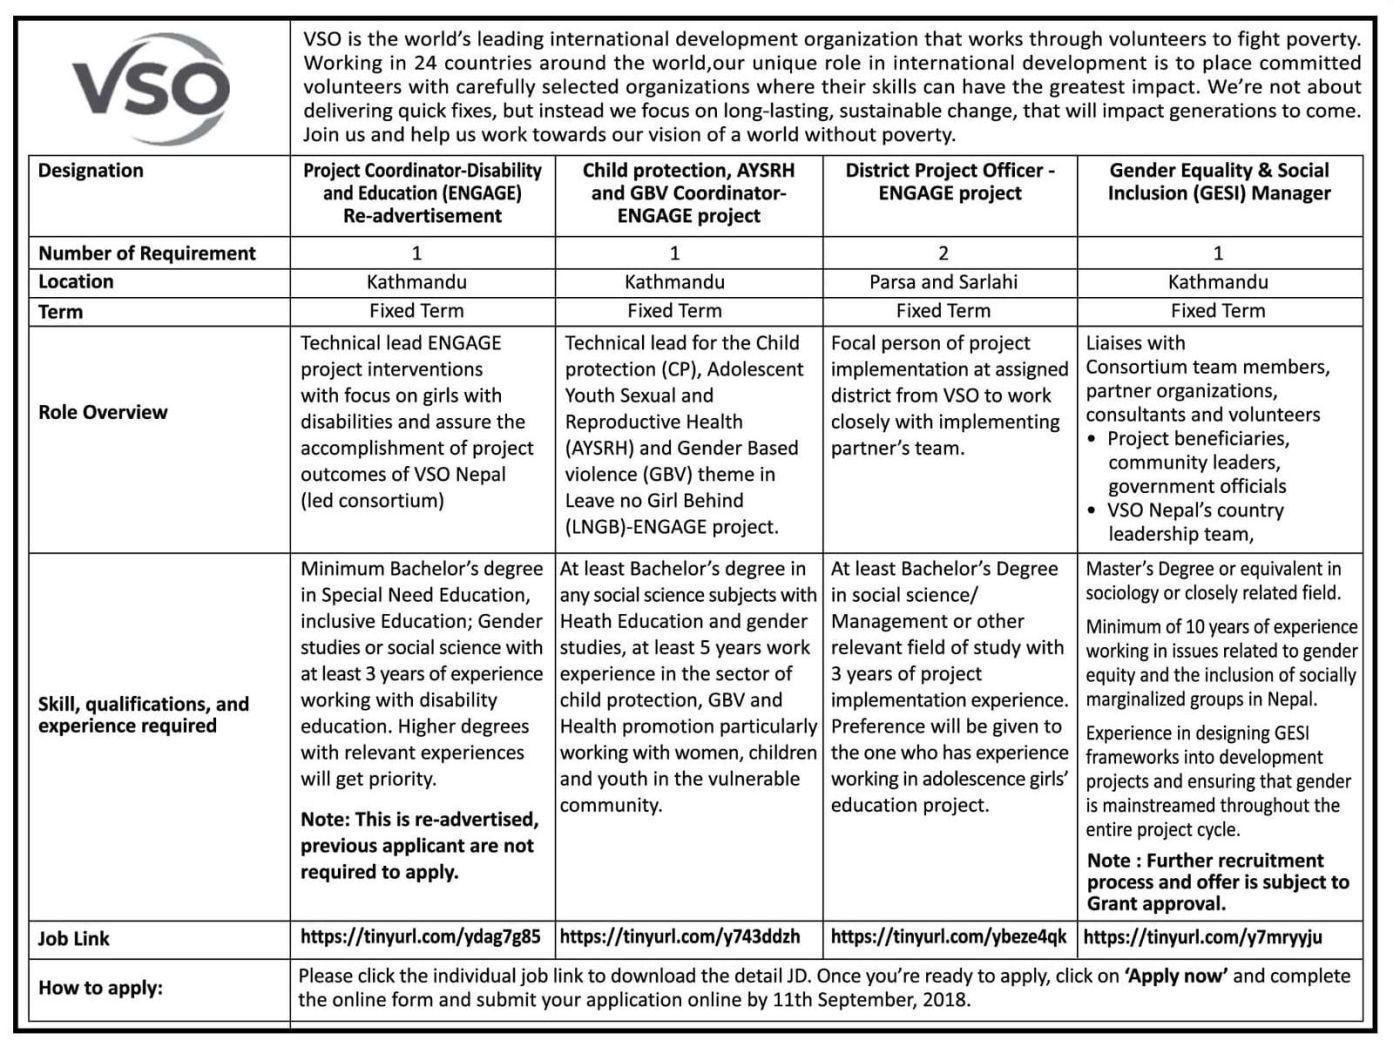 Jobs Nepal - INGO Vacancy - Project Coordinator, Child